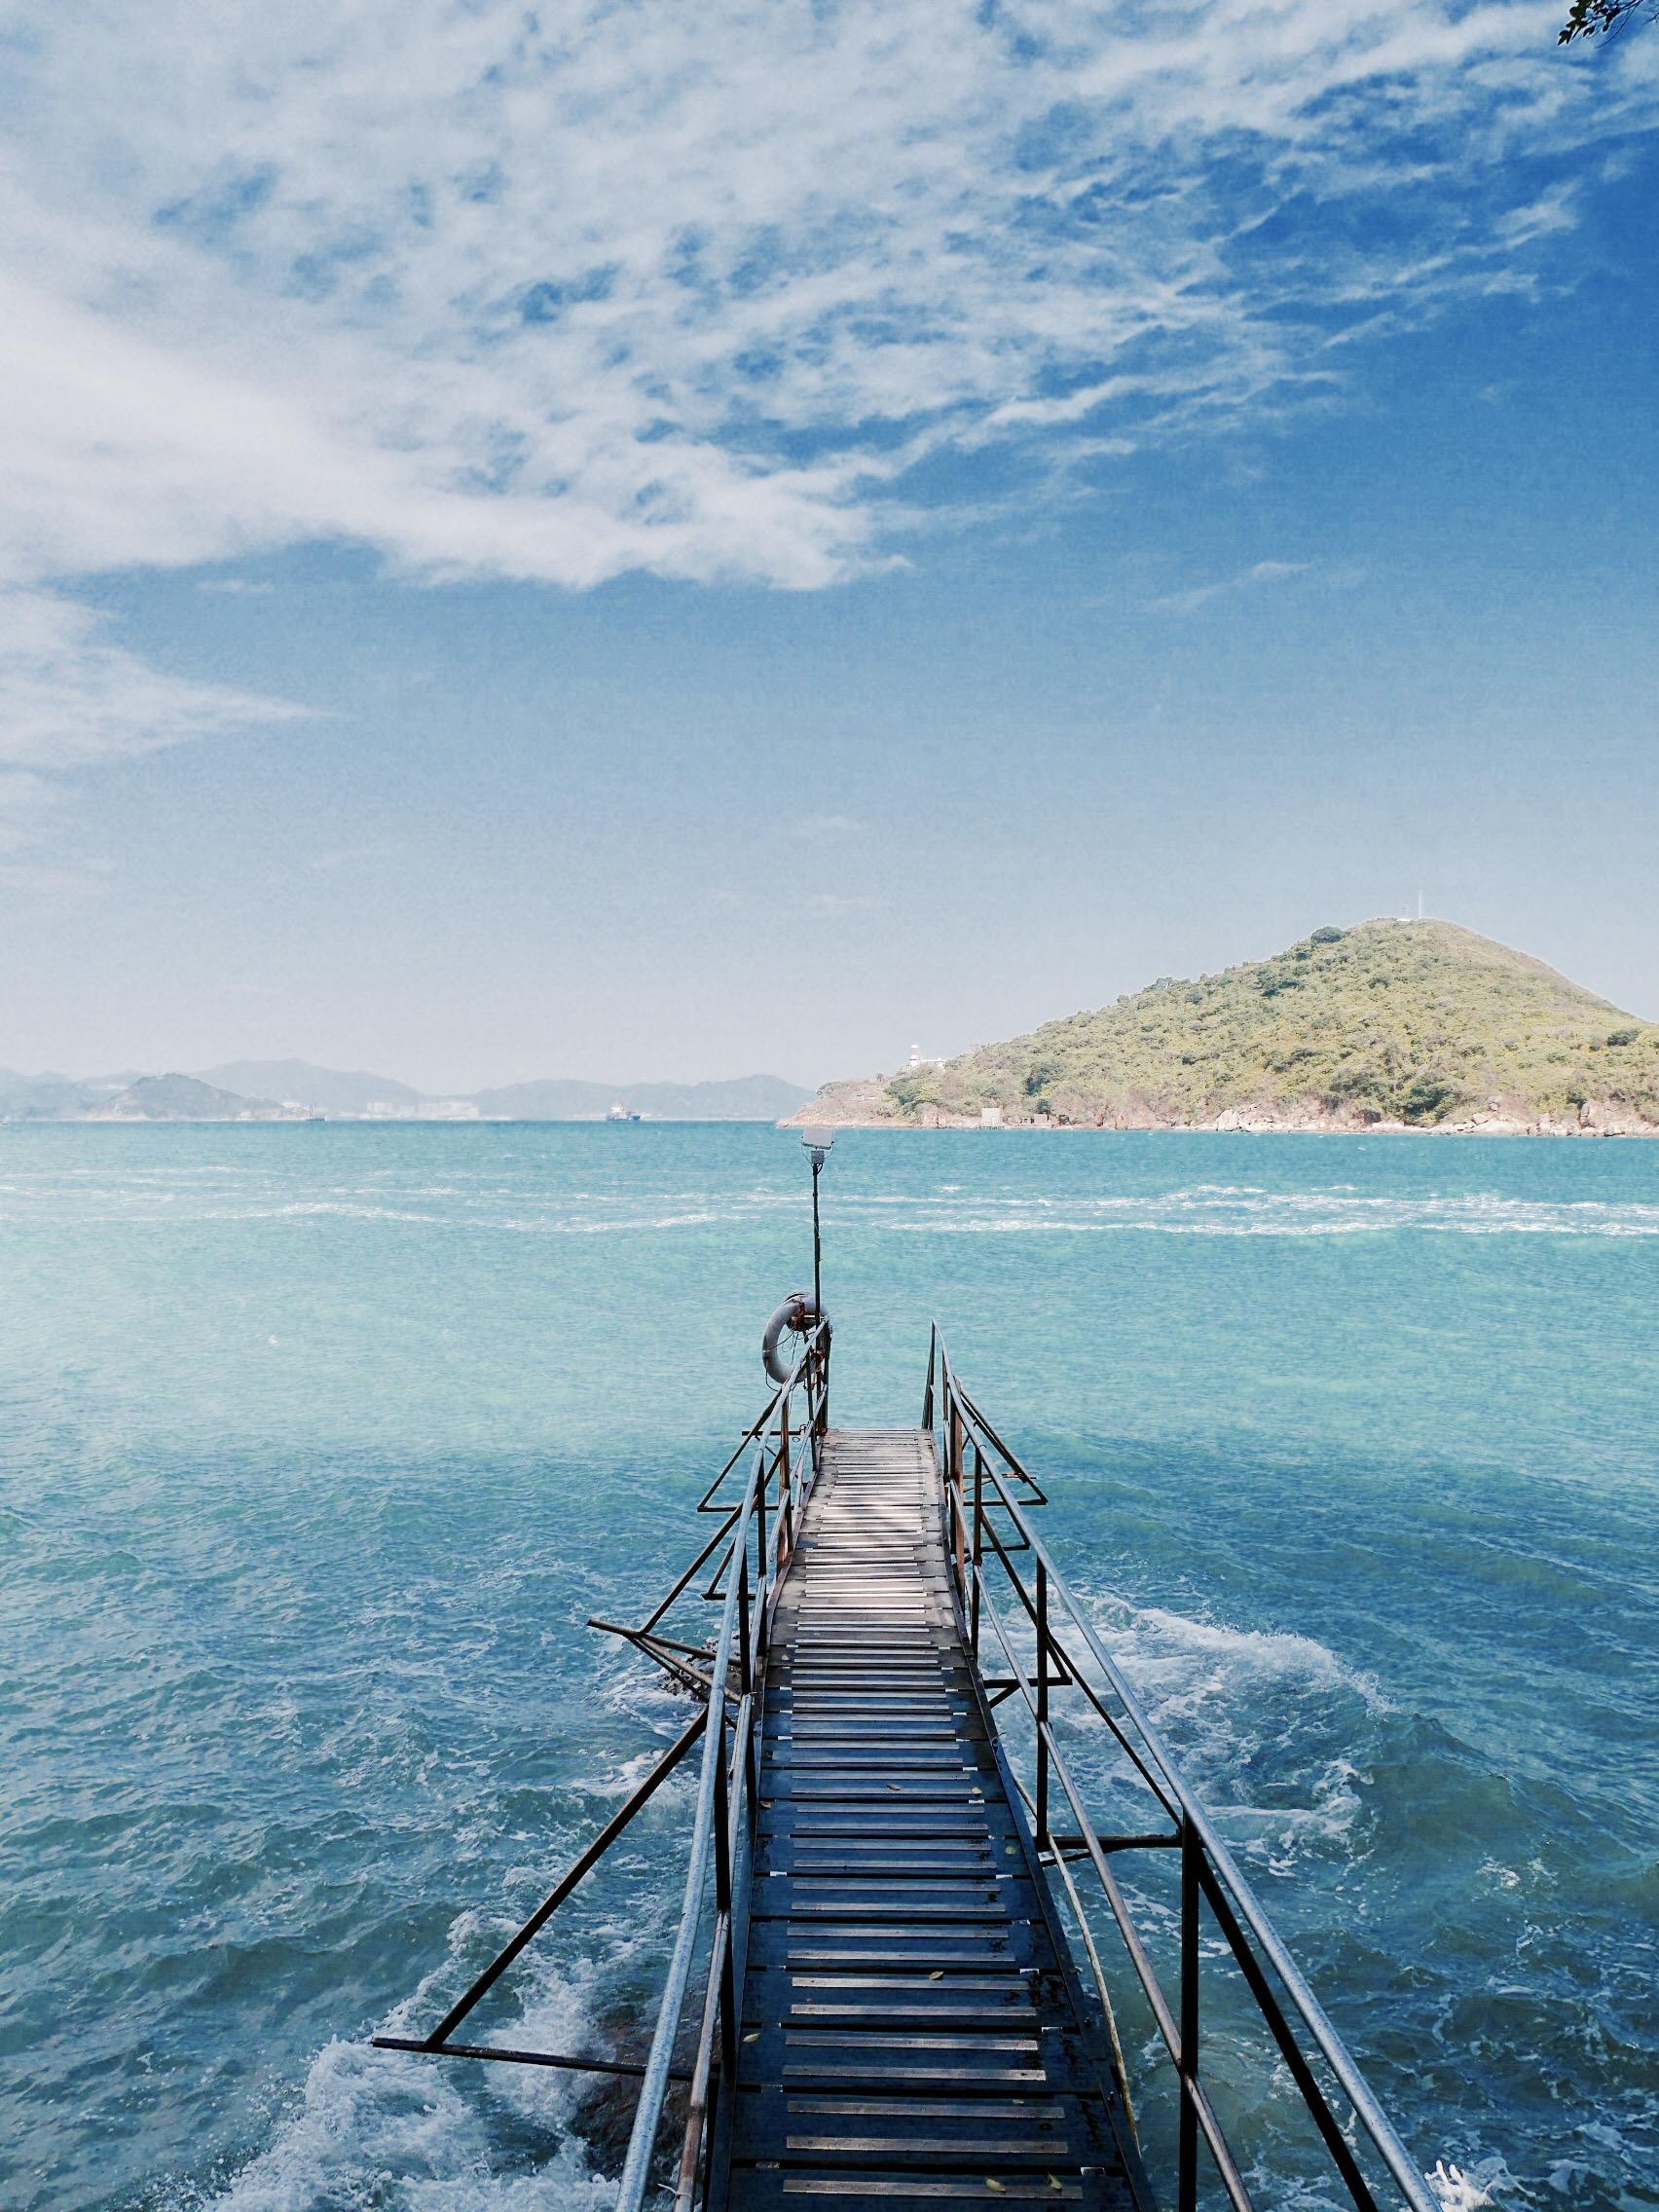 img 1274 - Sai Wan Swimming Shed - 香港のあまり知られていない絶景スポット